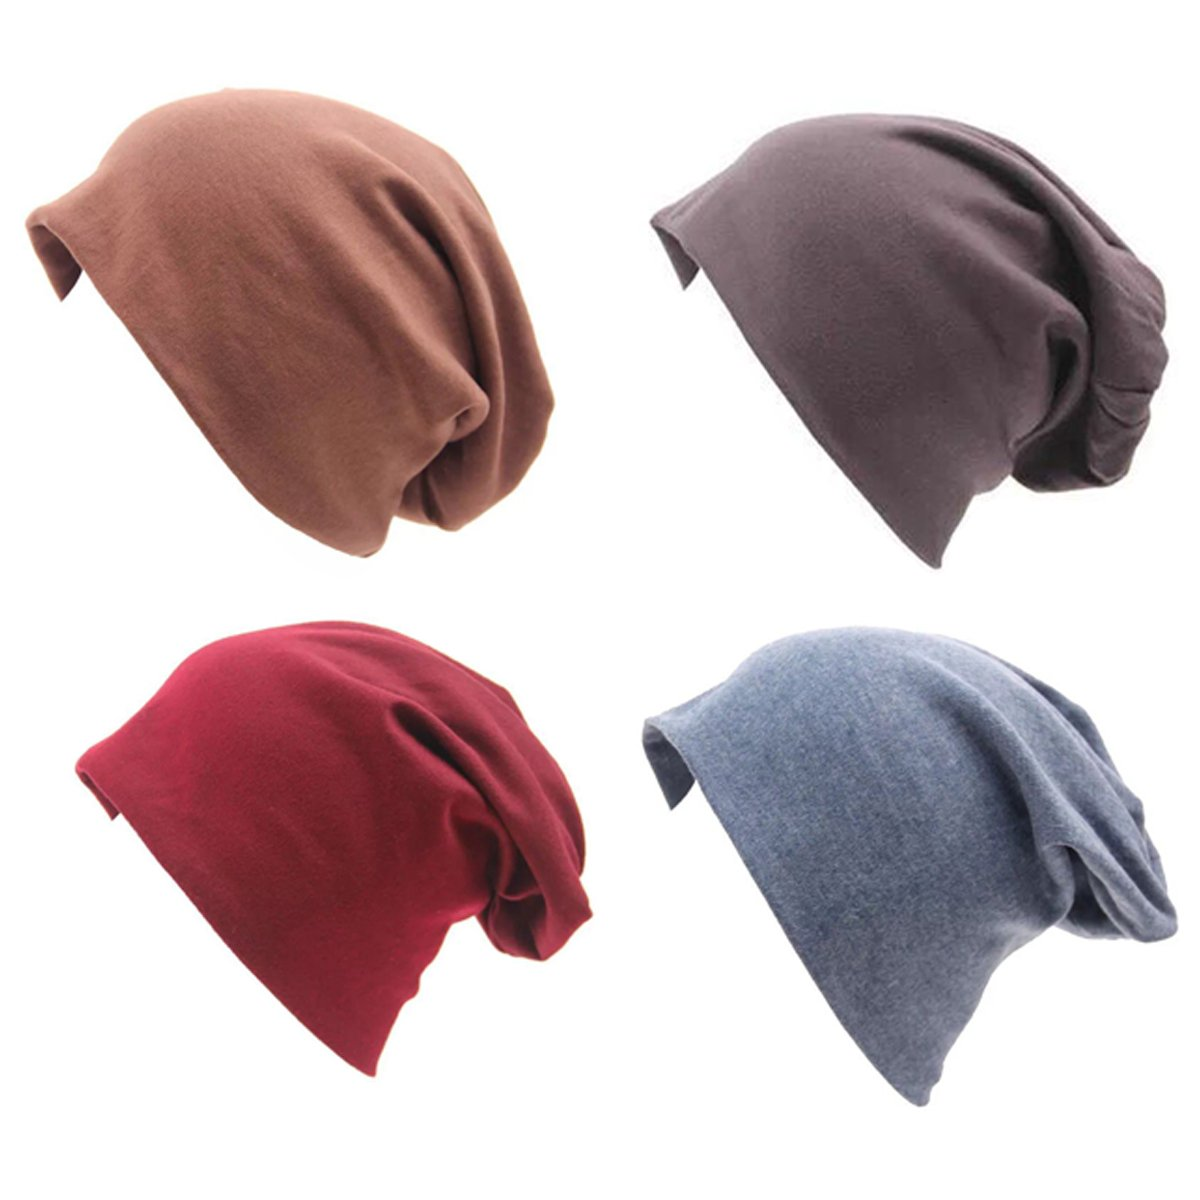 JOYEBUY 4 Pack Women Men Stylish Cotton Beanie Cap Slouchy Beanies Hats Soft Sleep Cap (Style D) by JOYEBUY